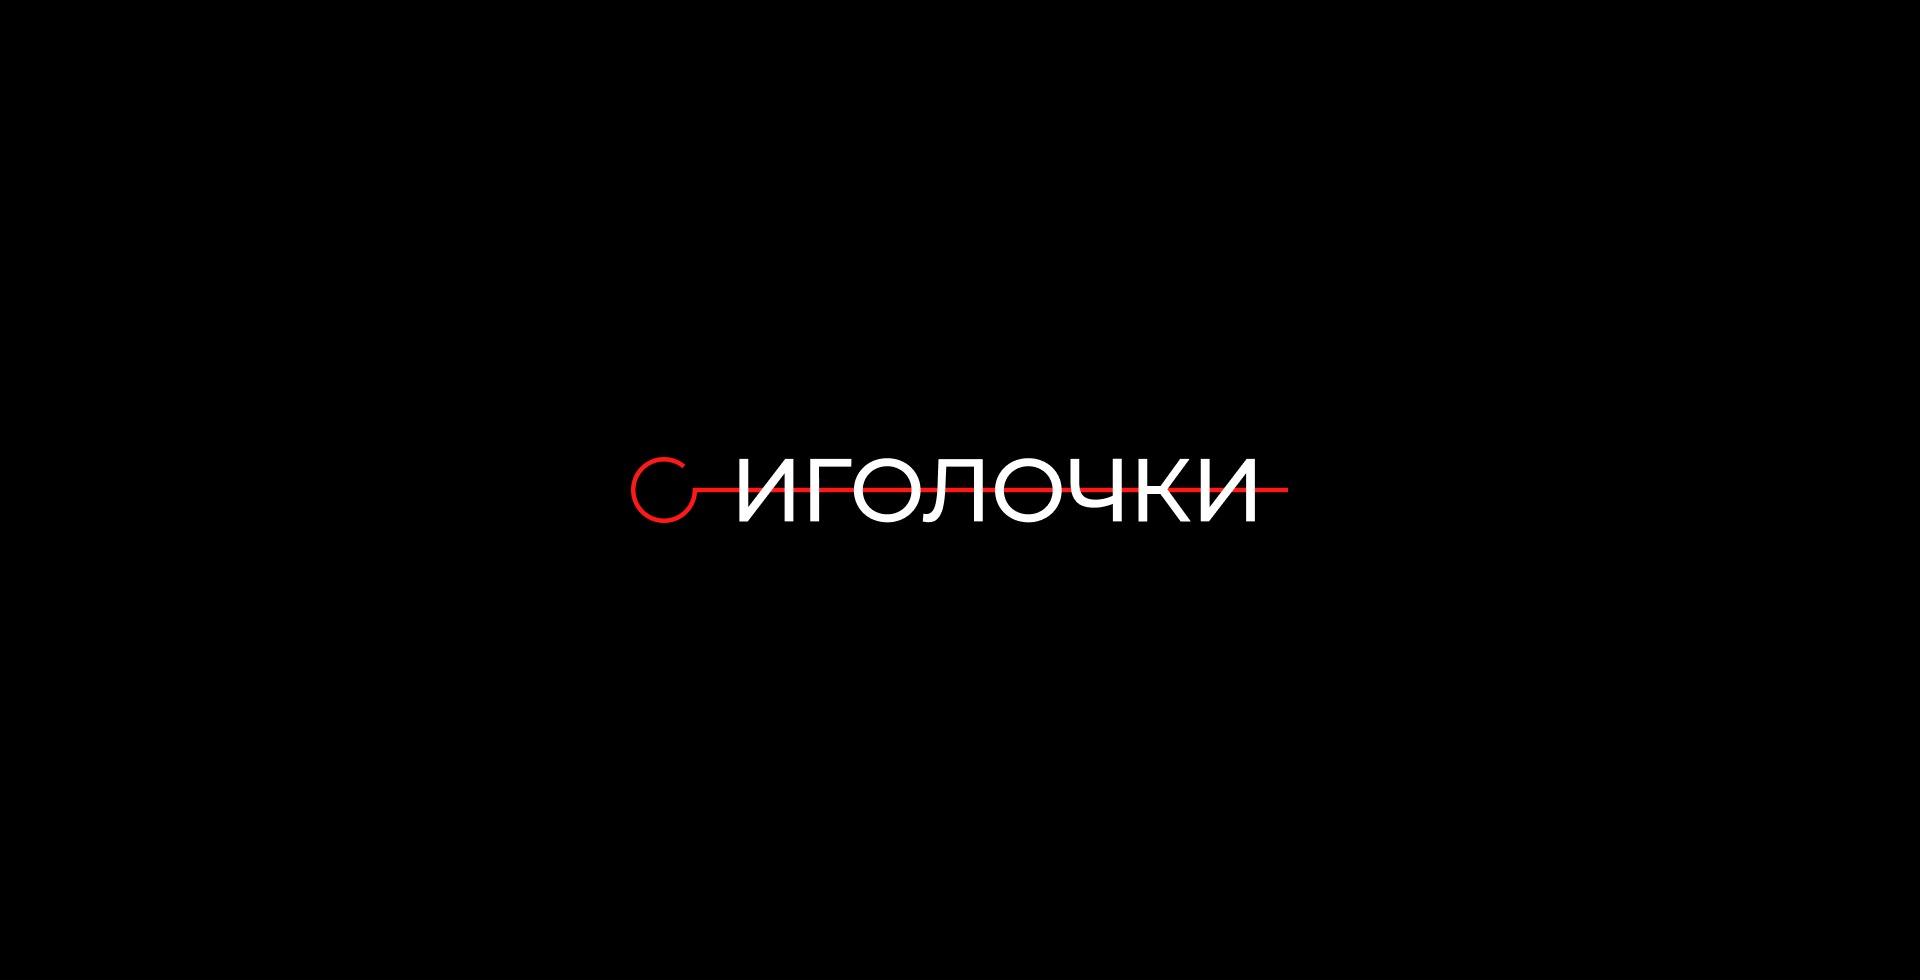 10-logofolio-02